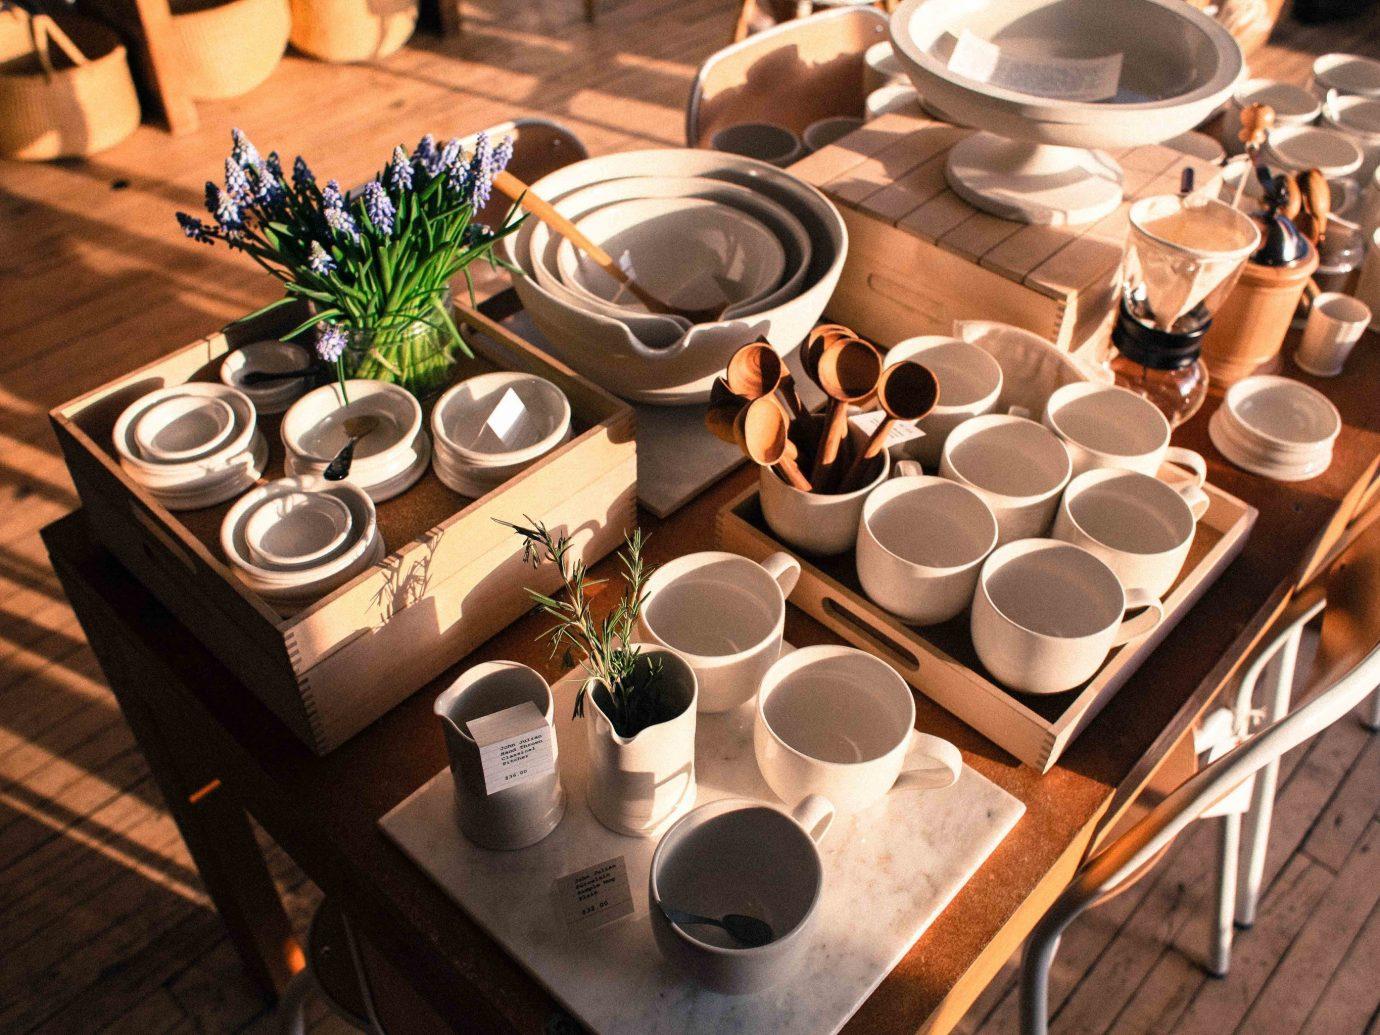 Trip Ideas table indoor floor tableware meal brunch food wooden breakfast dining table restaurant